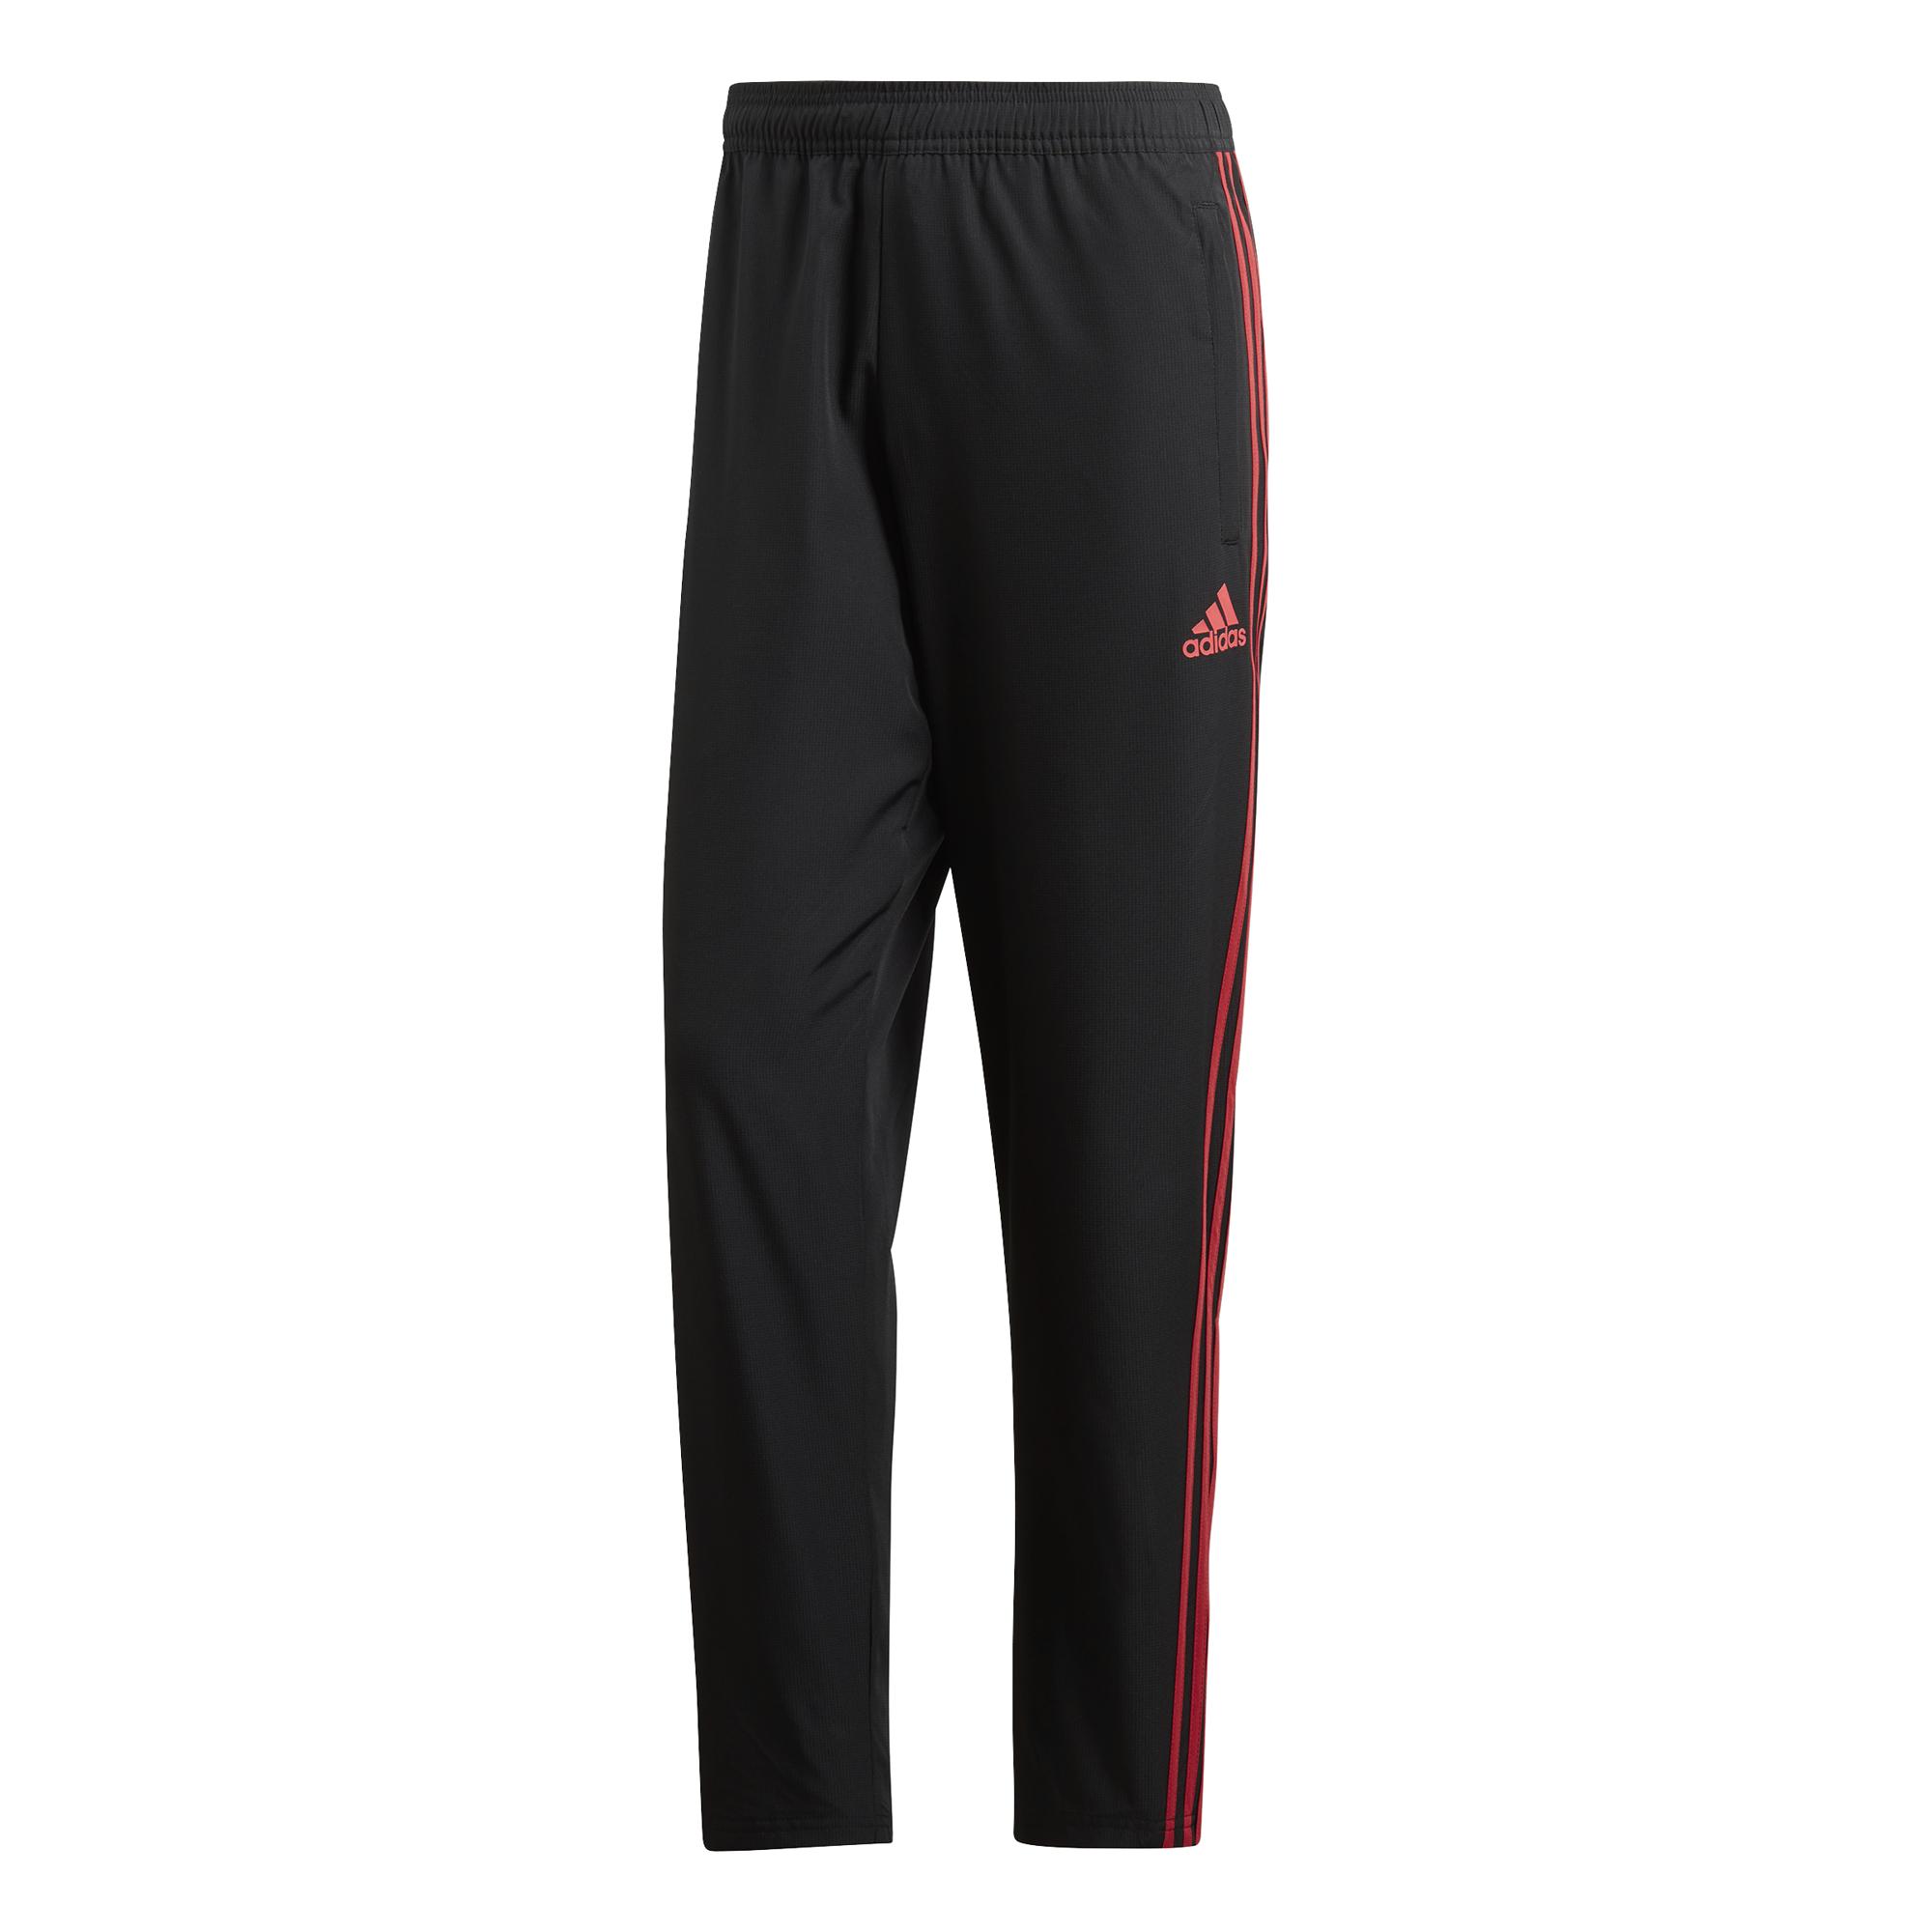 ADIDAS tkané kalhoty Manchester United